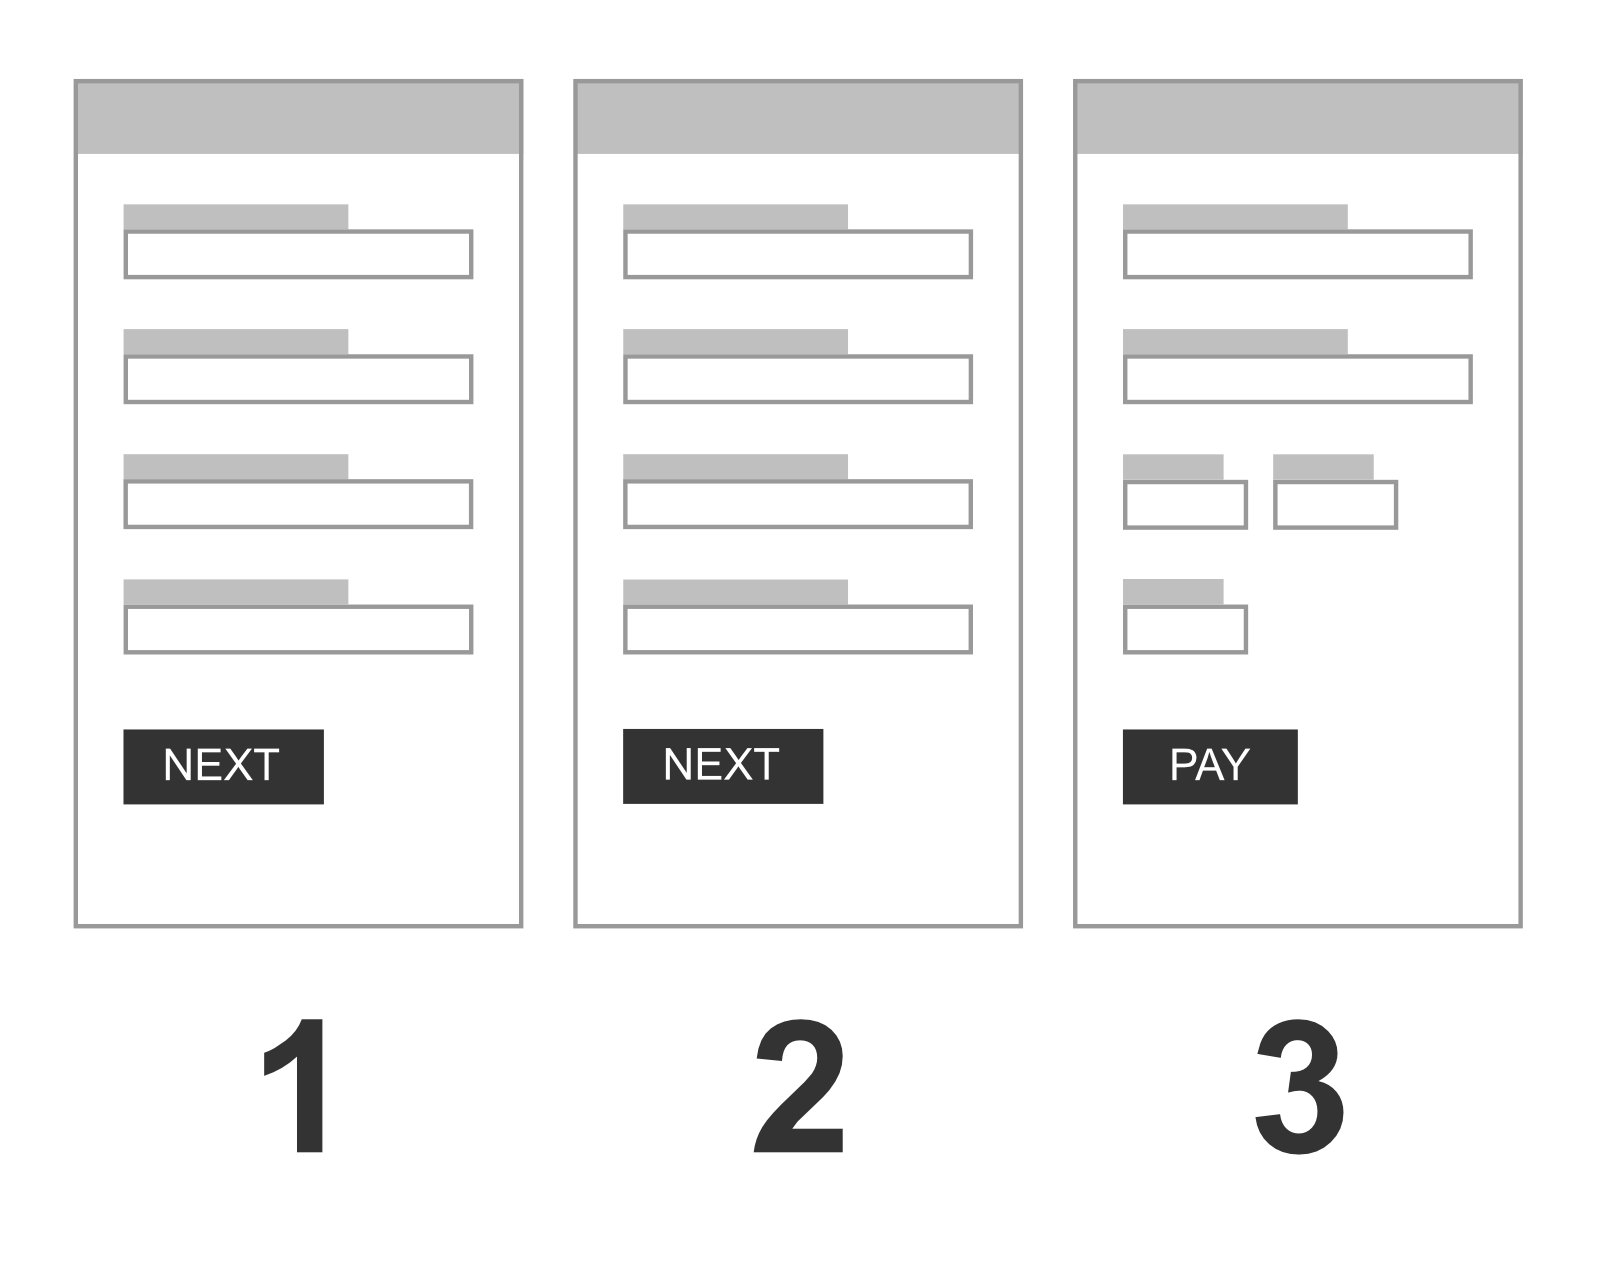 Multi step checkout process